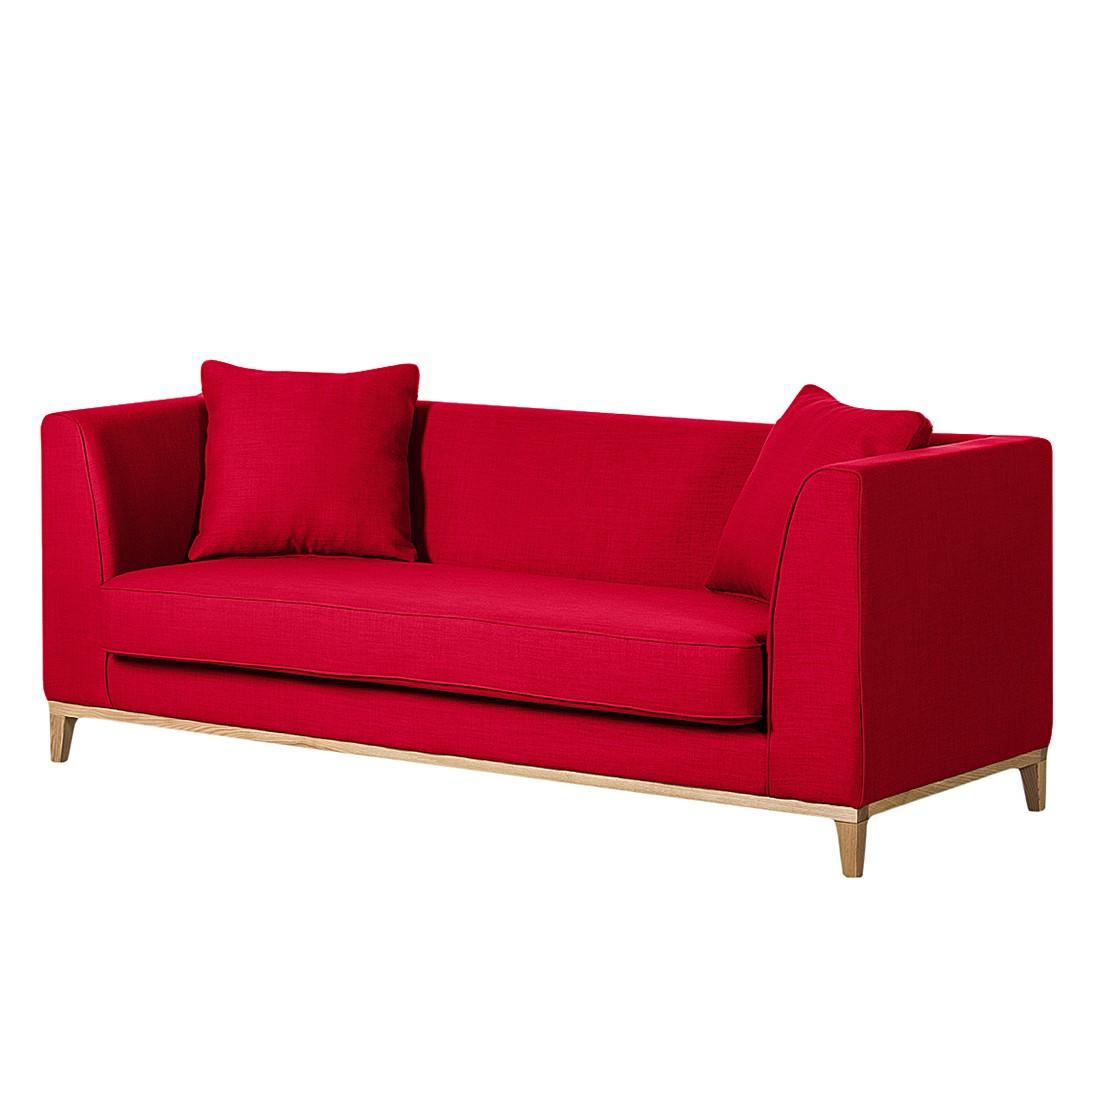 Sofa Blomma (3-Sitzer) – Webstoff Rot – Gestell: Eichefarbig, Mørteens kaufen